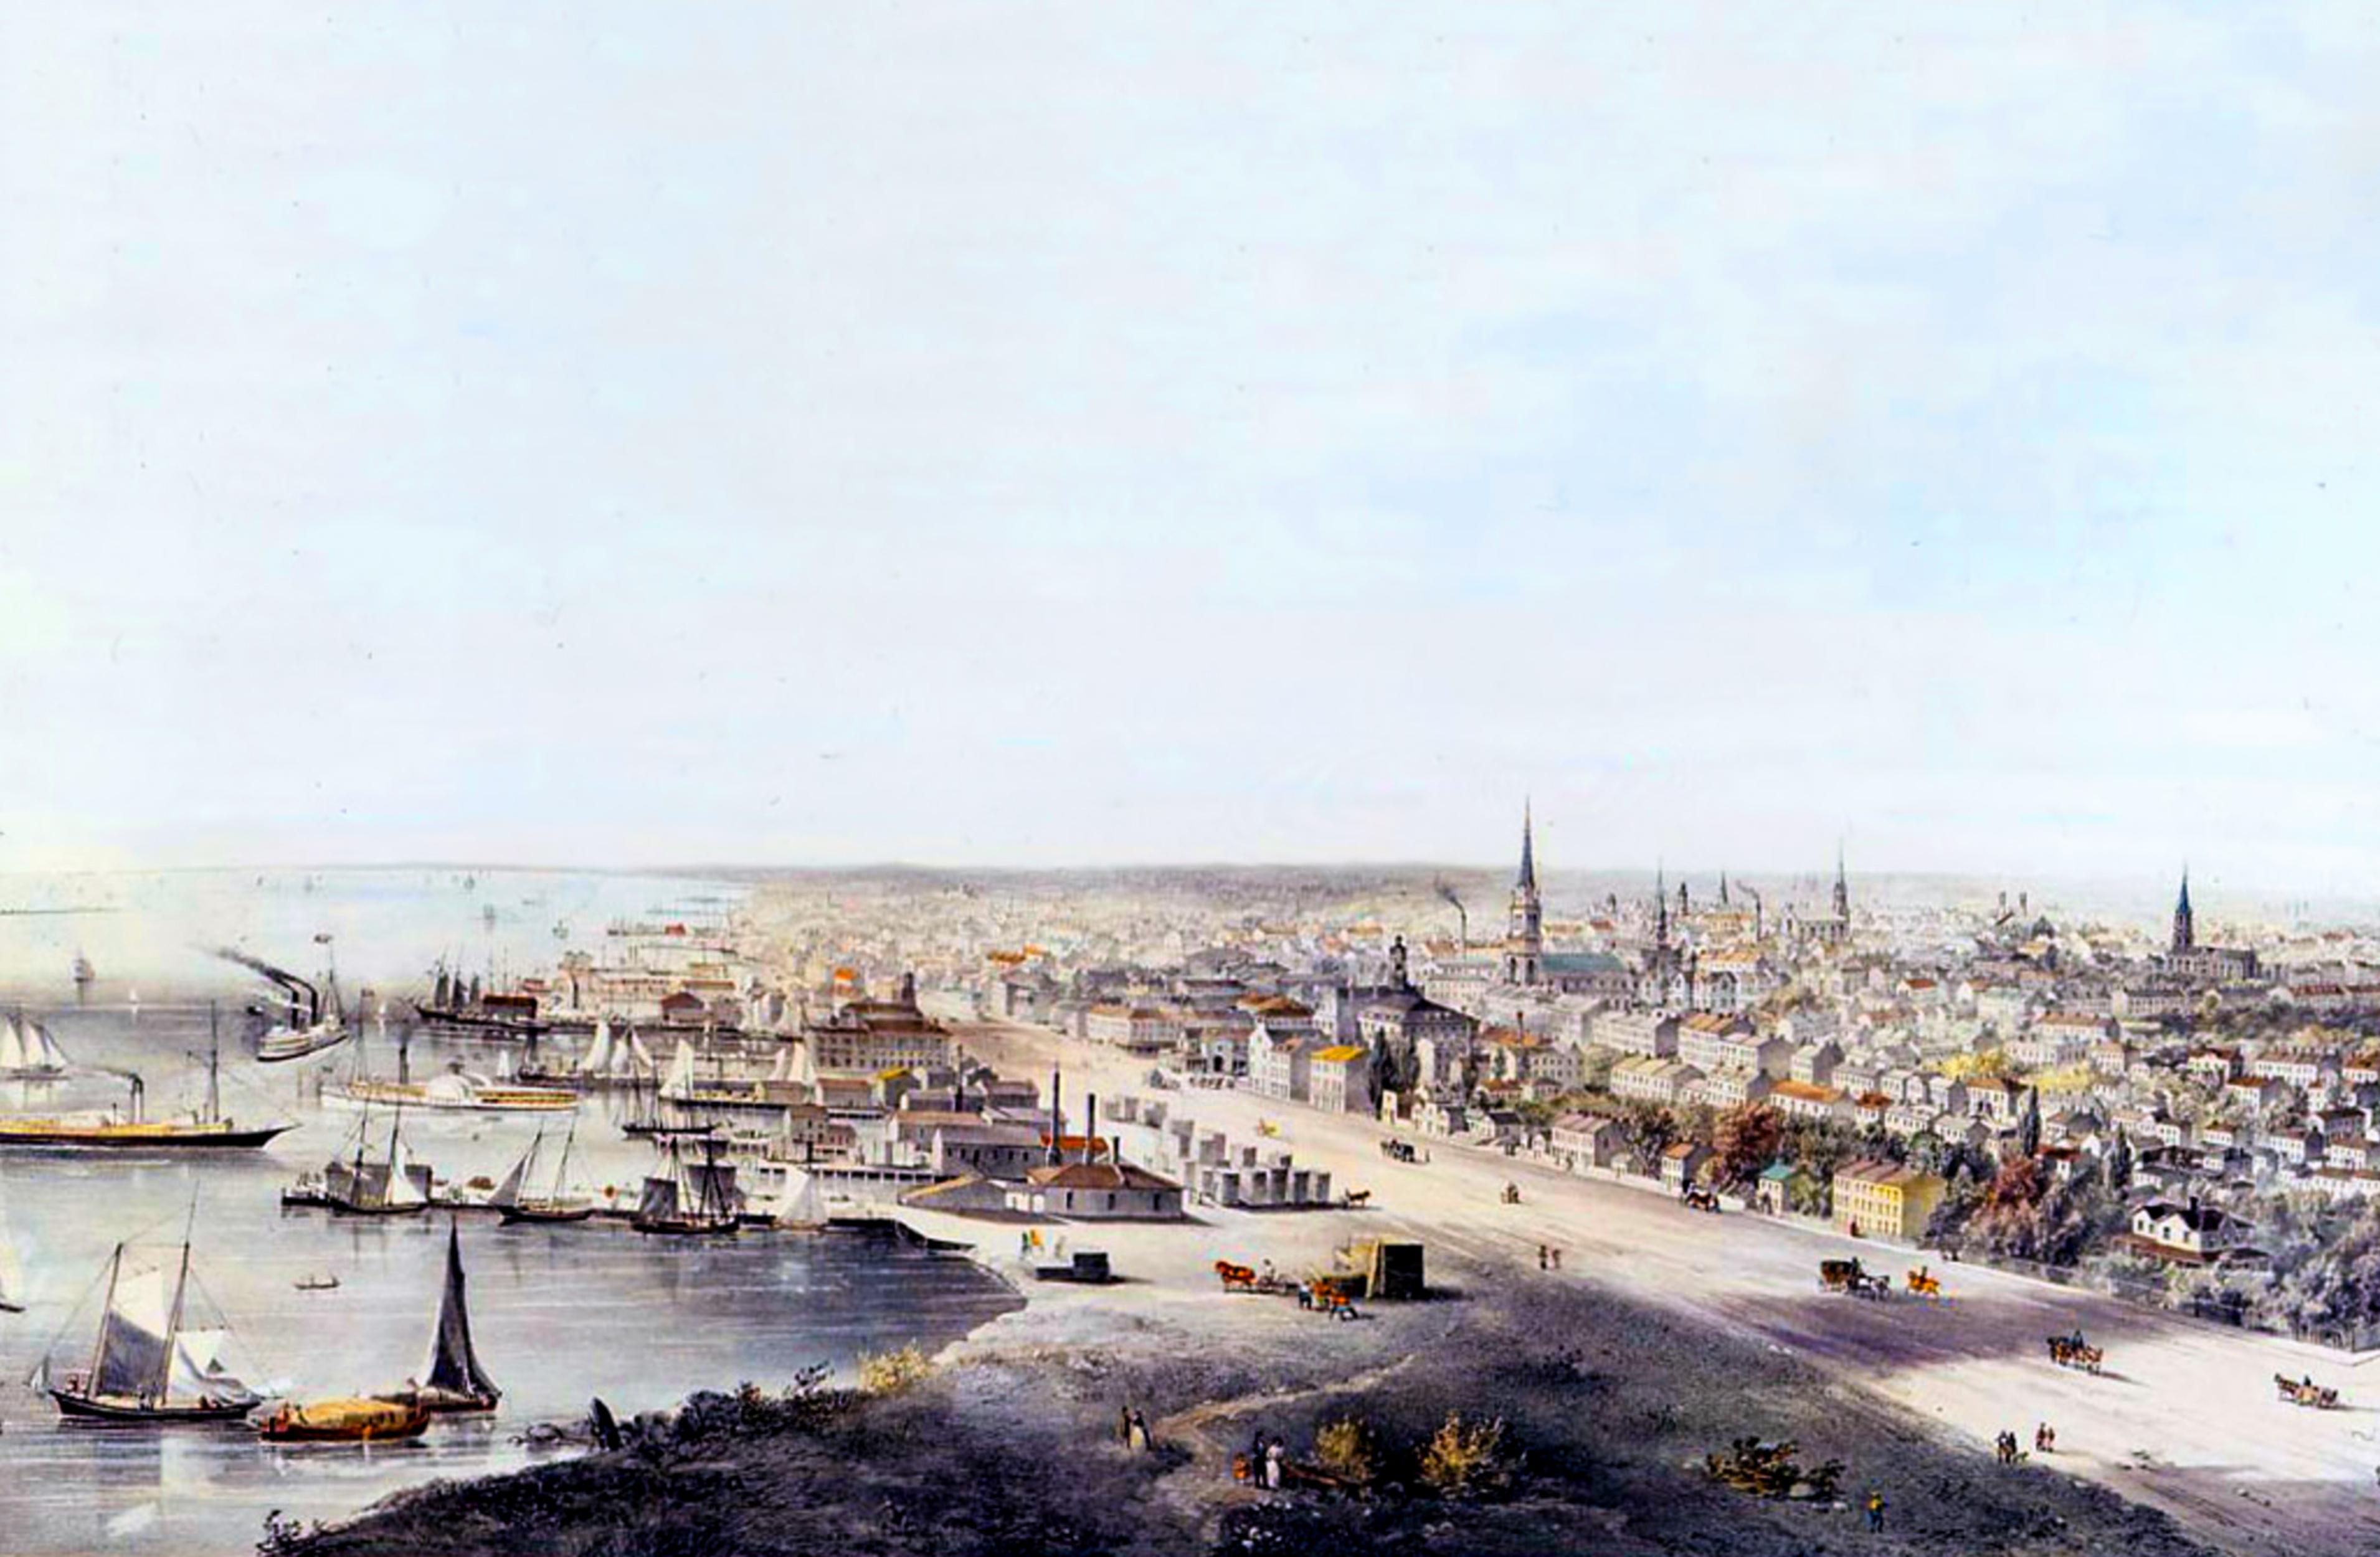 toronto waterfront 1800s